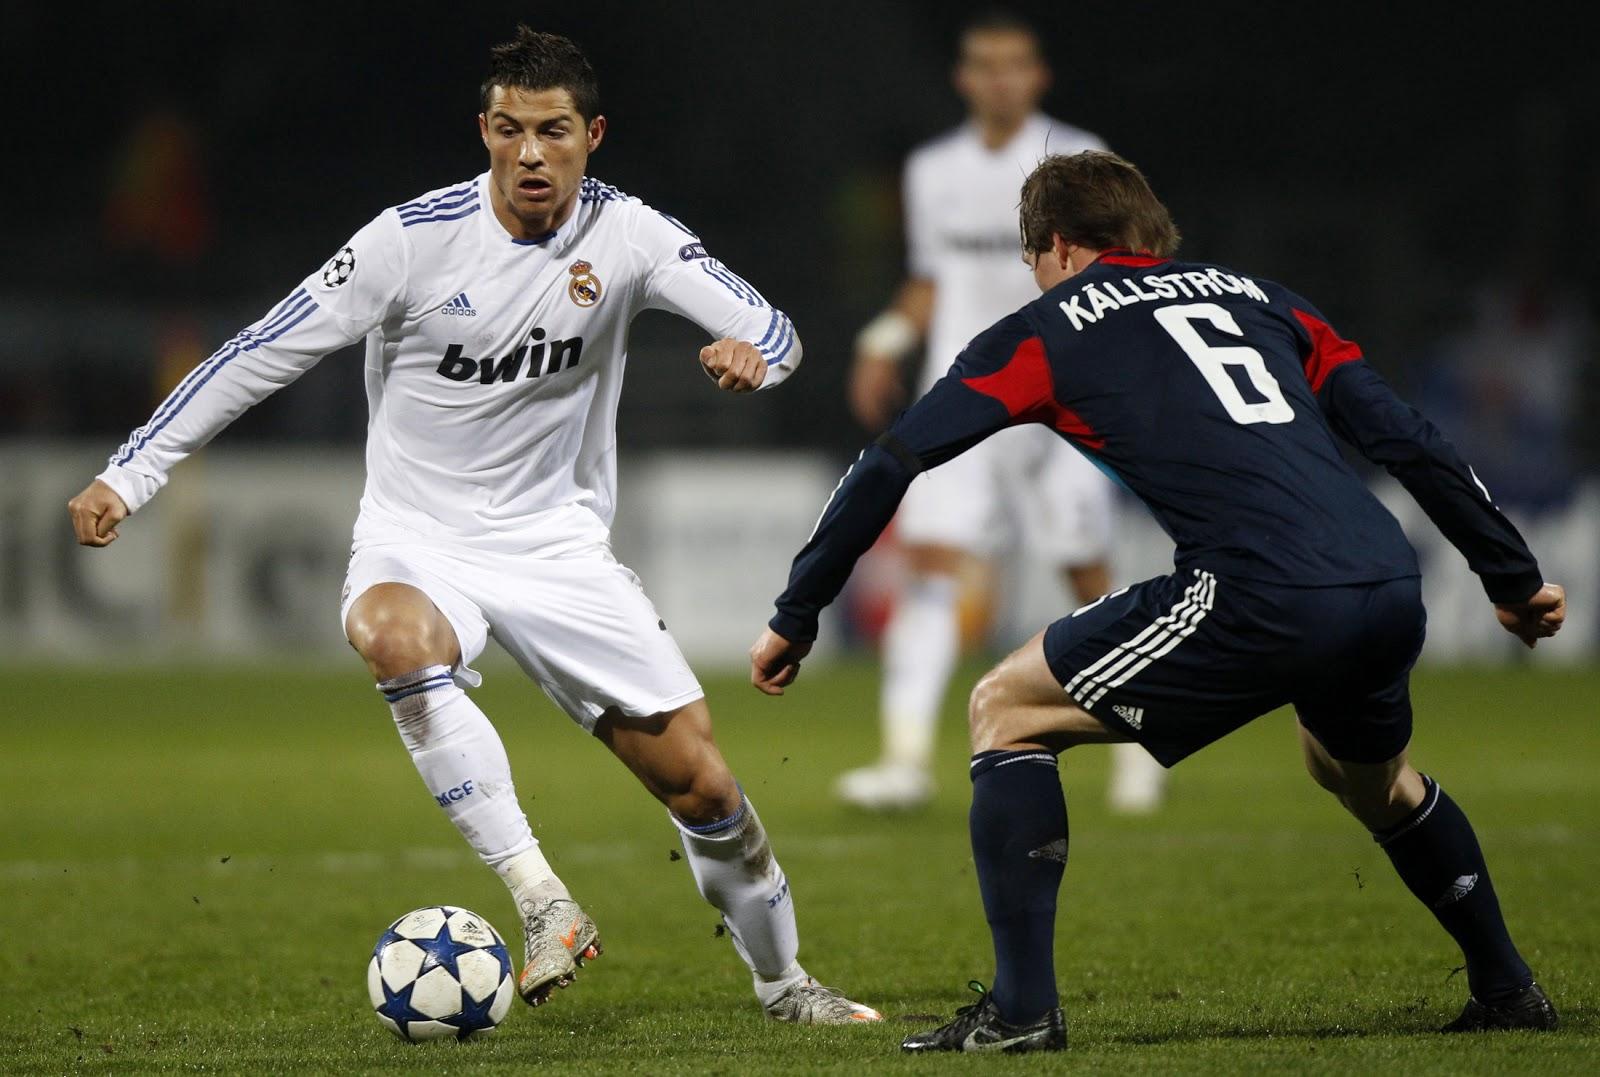 http://3.bp.blogspot.com/-trKfkPGNjJY/UItjKDCDv8I/AAAAAAAAAF8/m6GqbuCtLnA/s1600/Cristiano-Ronaldo-Lyon-Real-Madrid.jpg